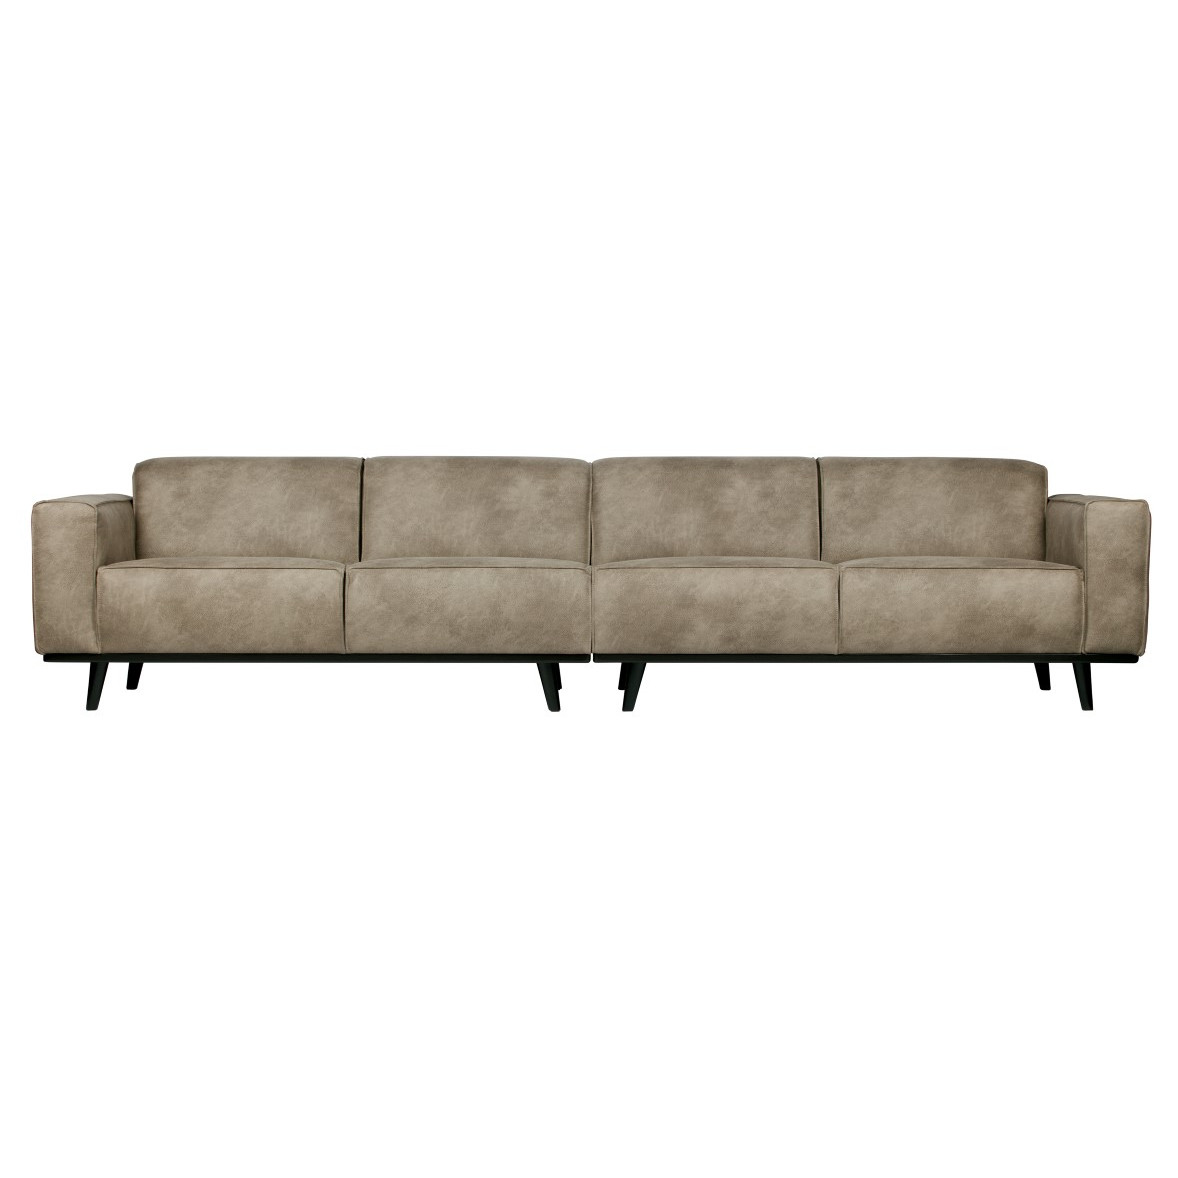 4er-Sofa Statement | Grau